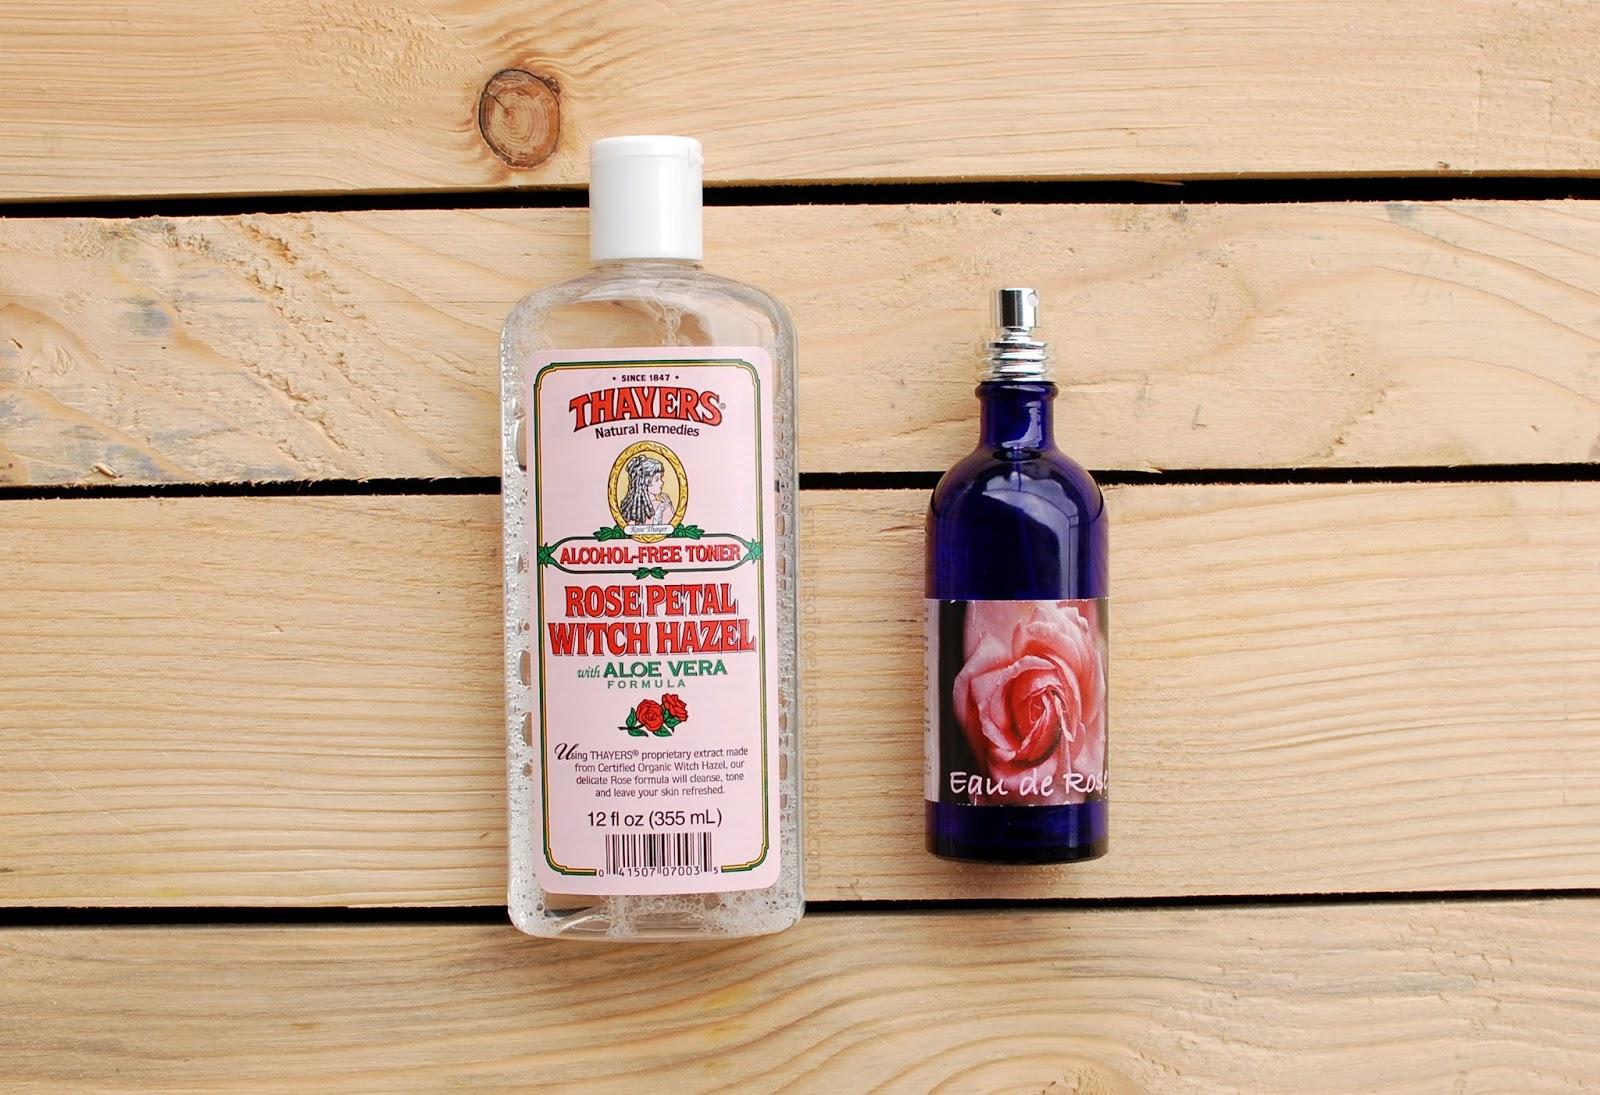 Thayers Rose Petal Witch Hazel with Aloe Vera Alcohol Free Toner, Argana Rose Water